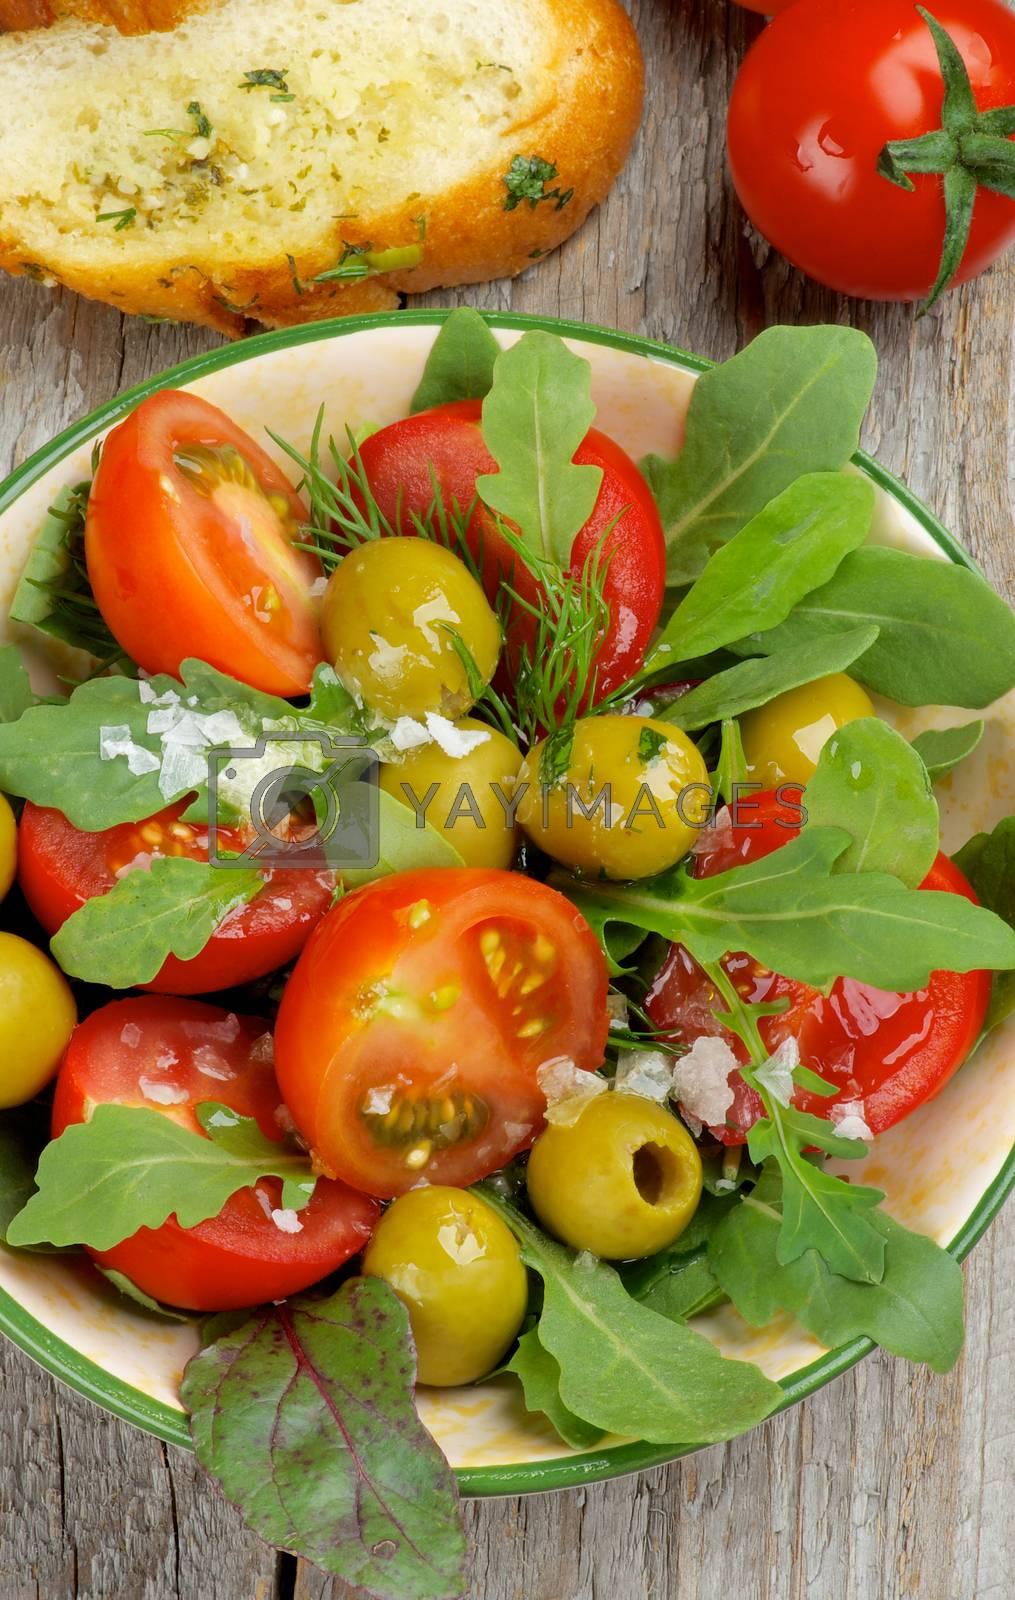 Tomatoes Salad by zhekos